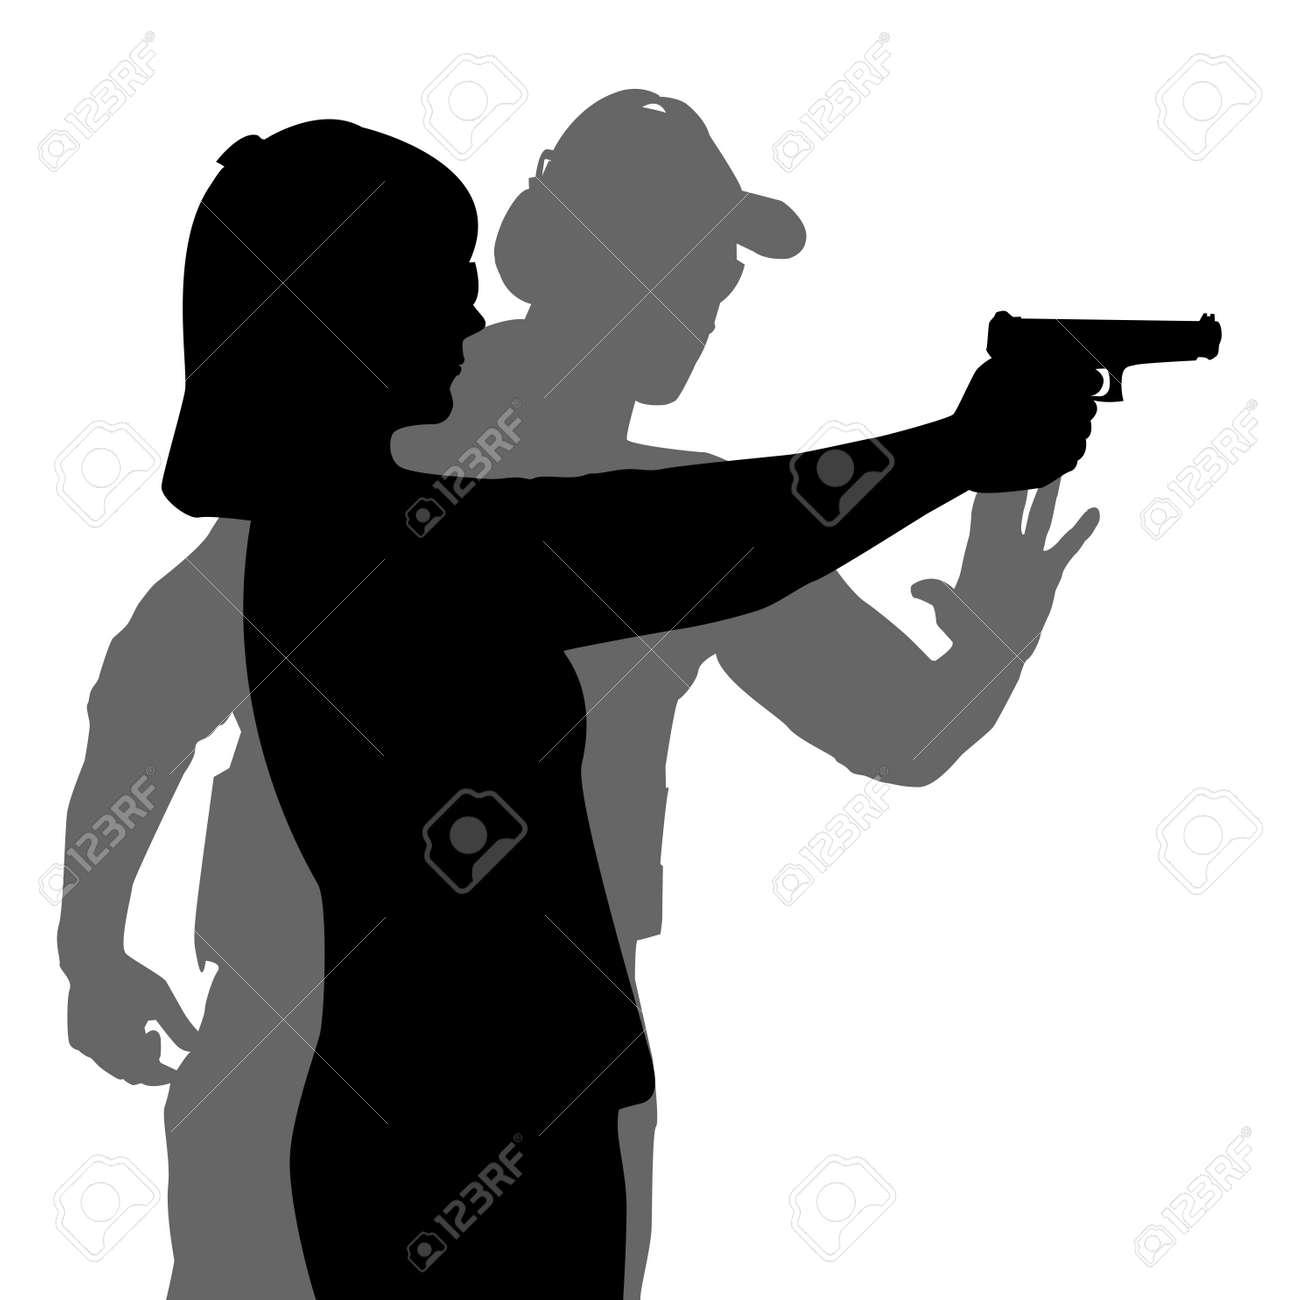 hight resolution of instructor assisting woman aiming hand gun at firing range